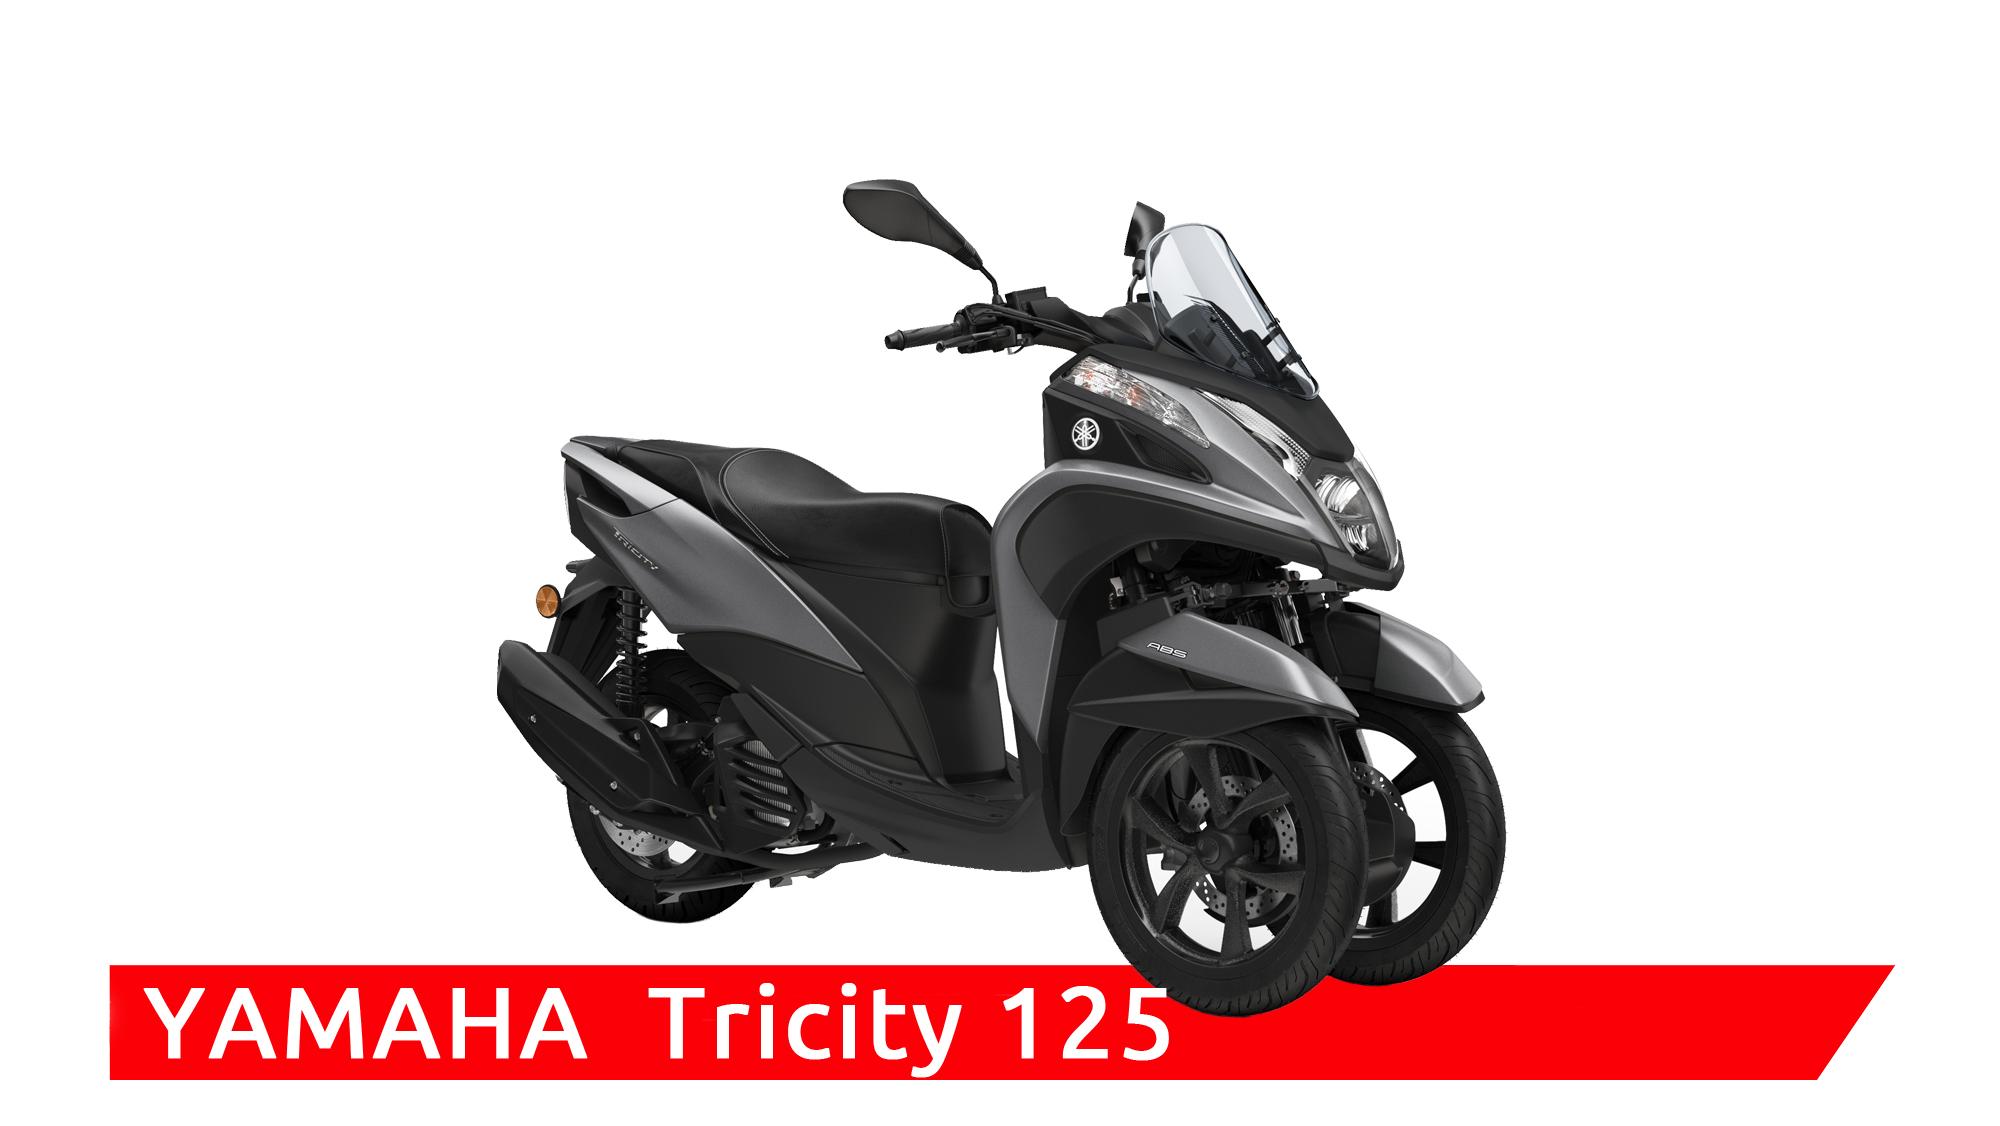 Tricity 125